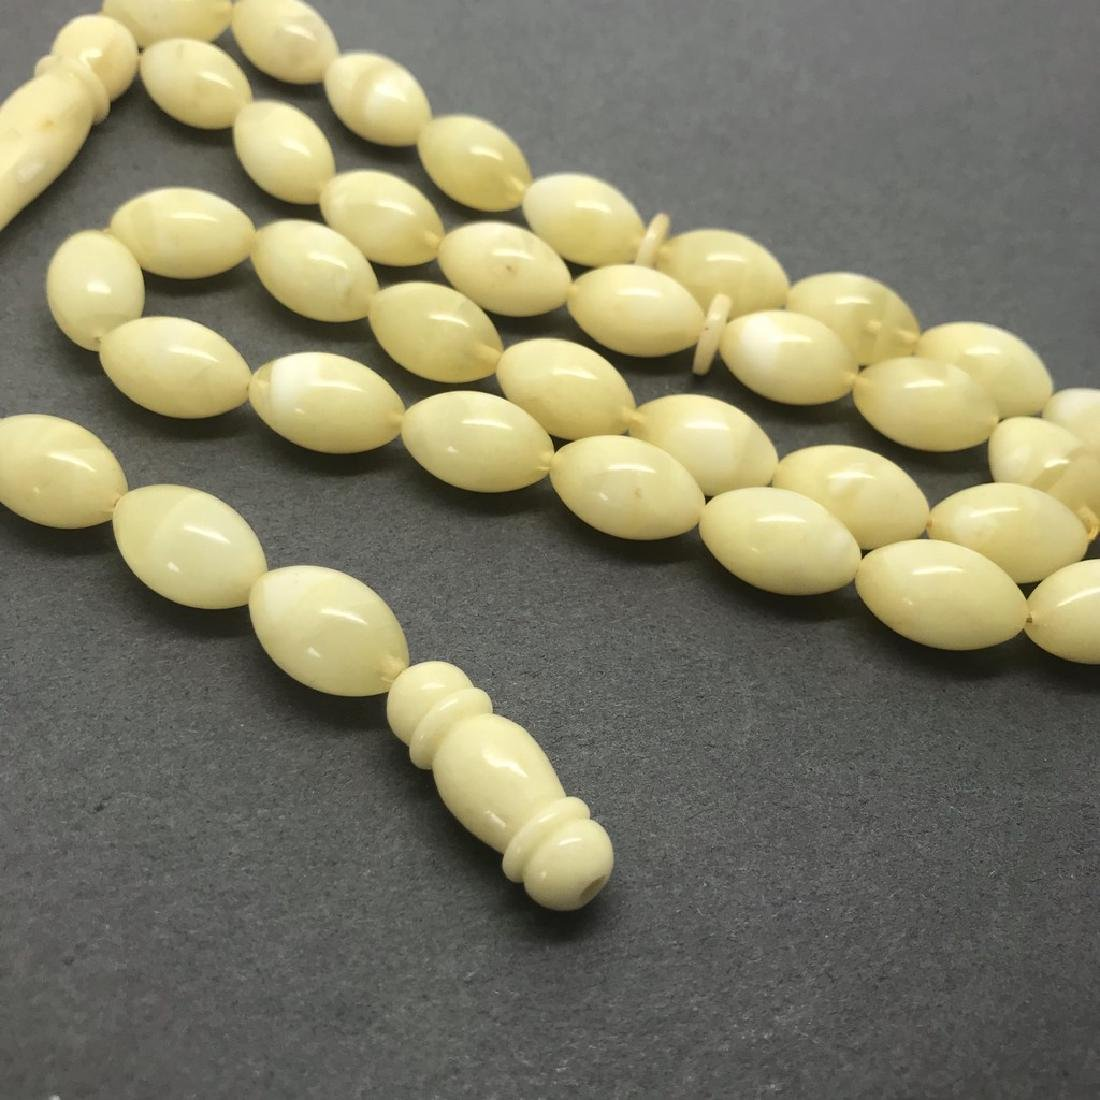 Misbaha tesbih Baltic amber white 33 beads 16x11mm 39.3 - 3